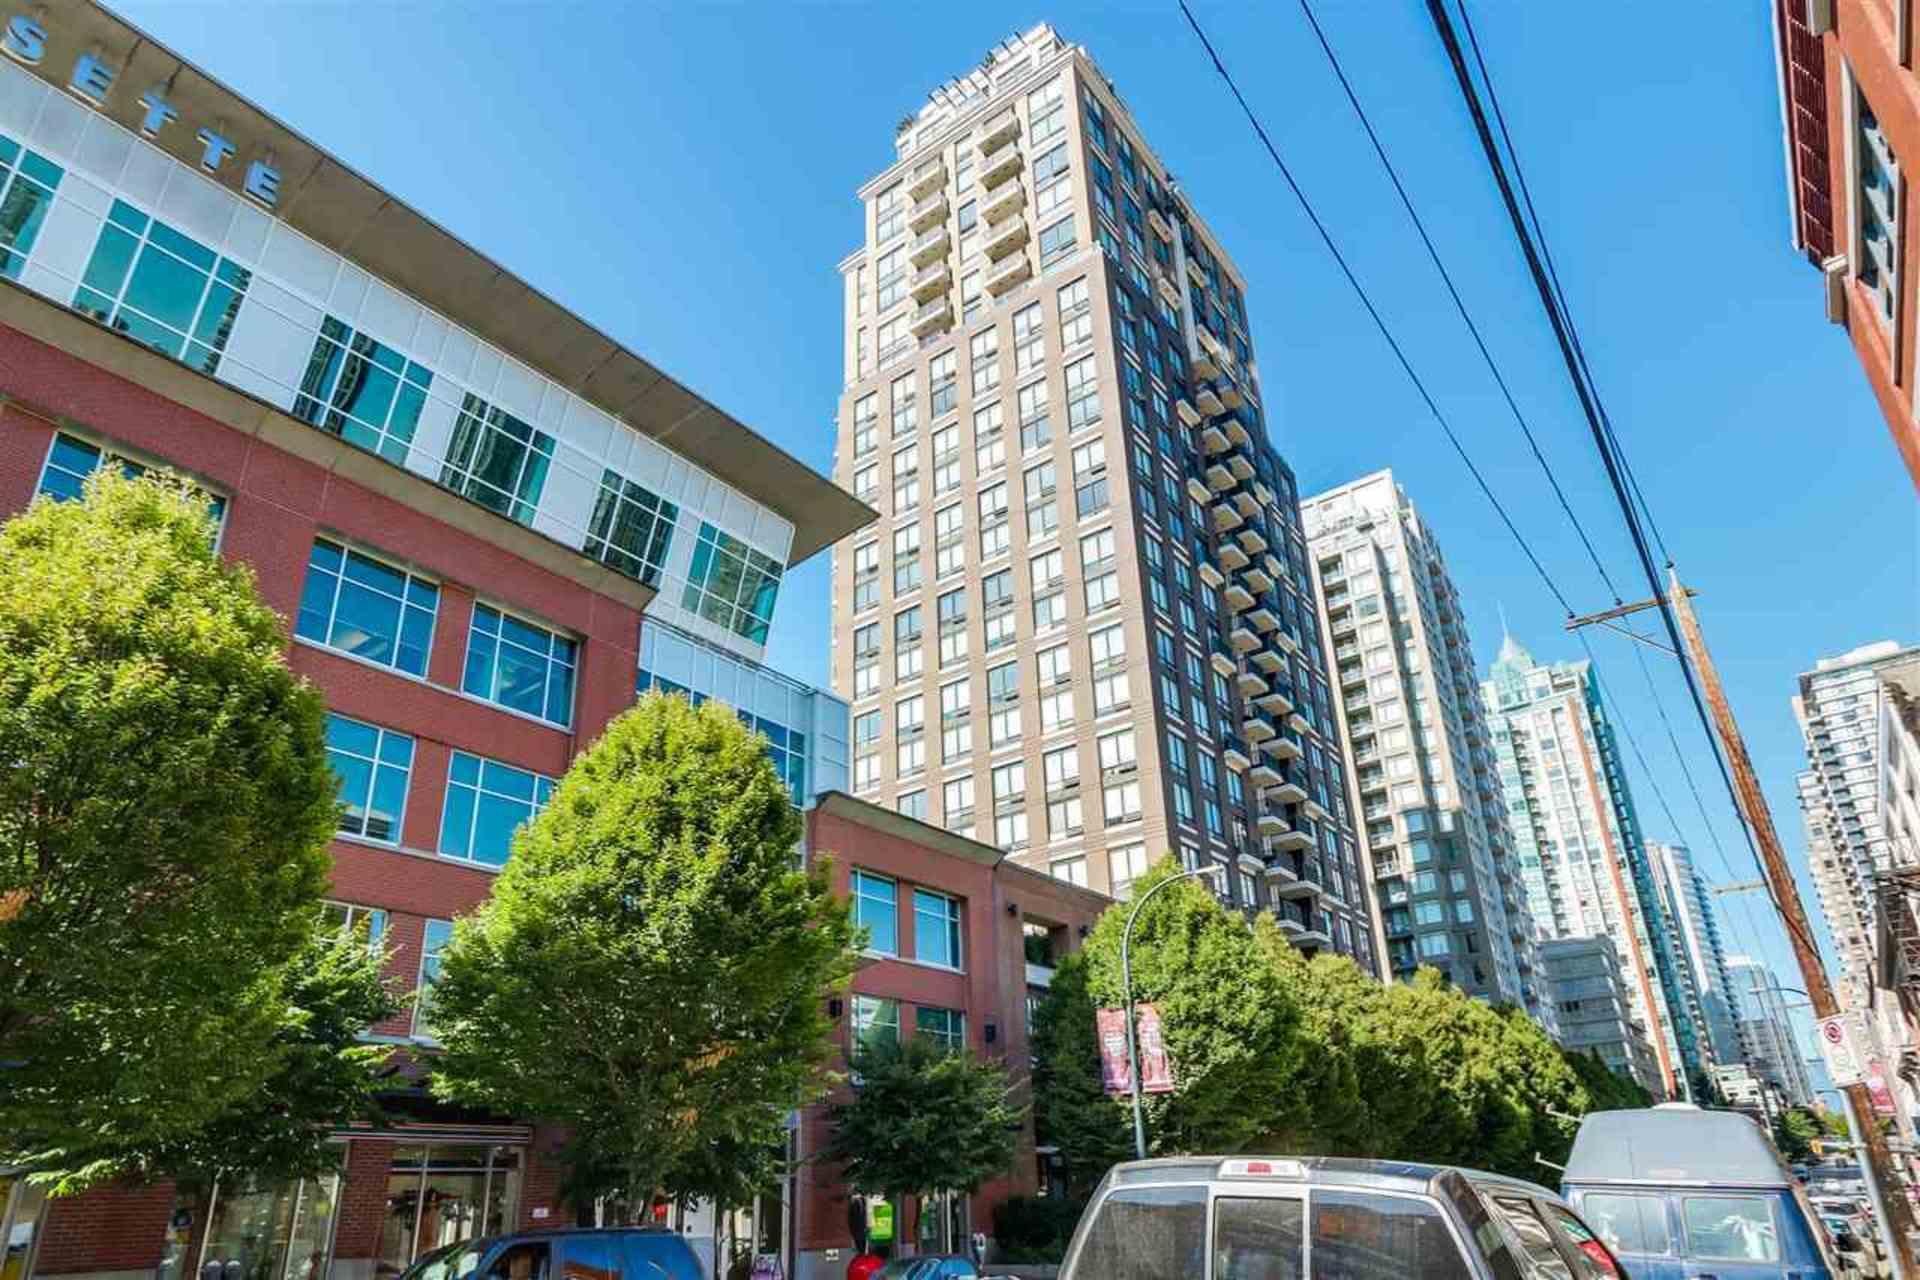 1055-homer-street-yaletown-vancouver-west-01 at 1101 - 1055 Homer Street, Yaletown, Vancouver West